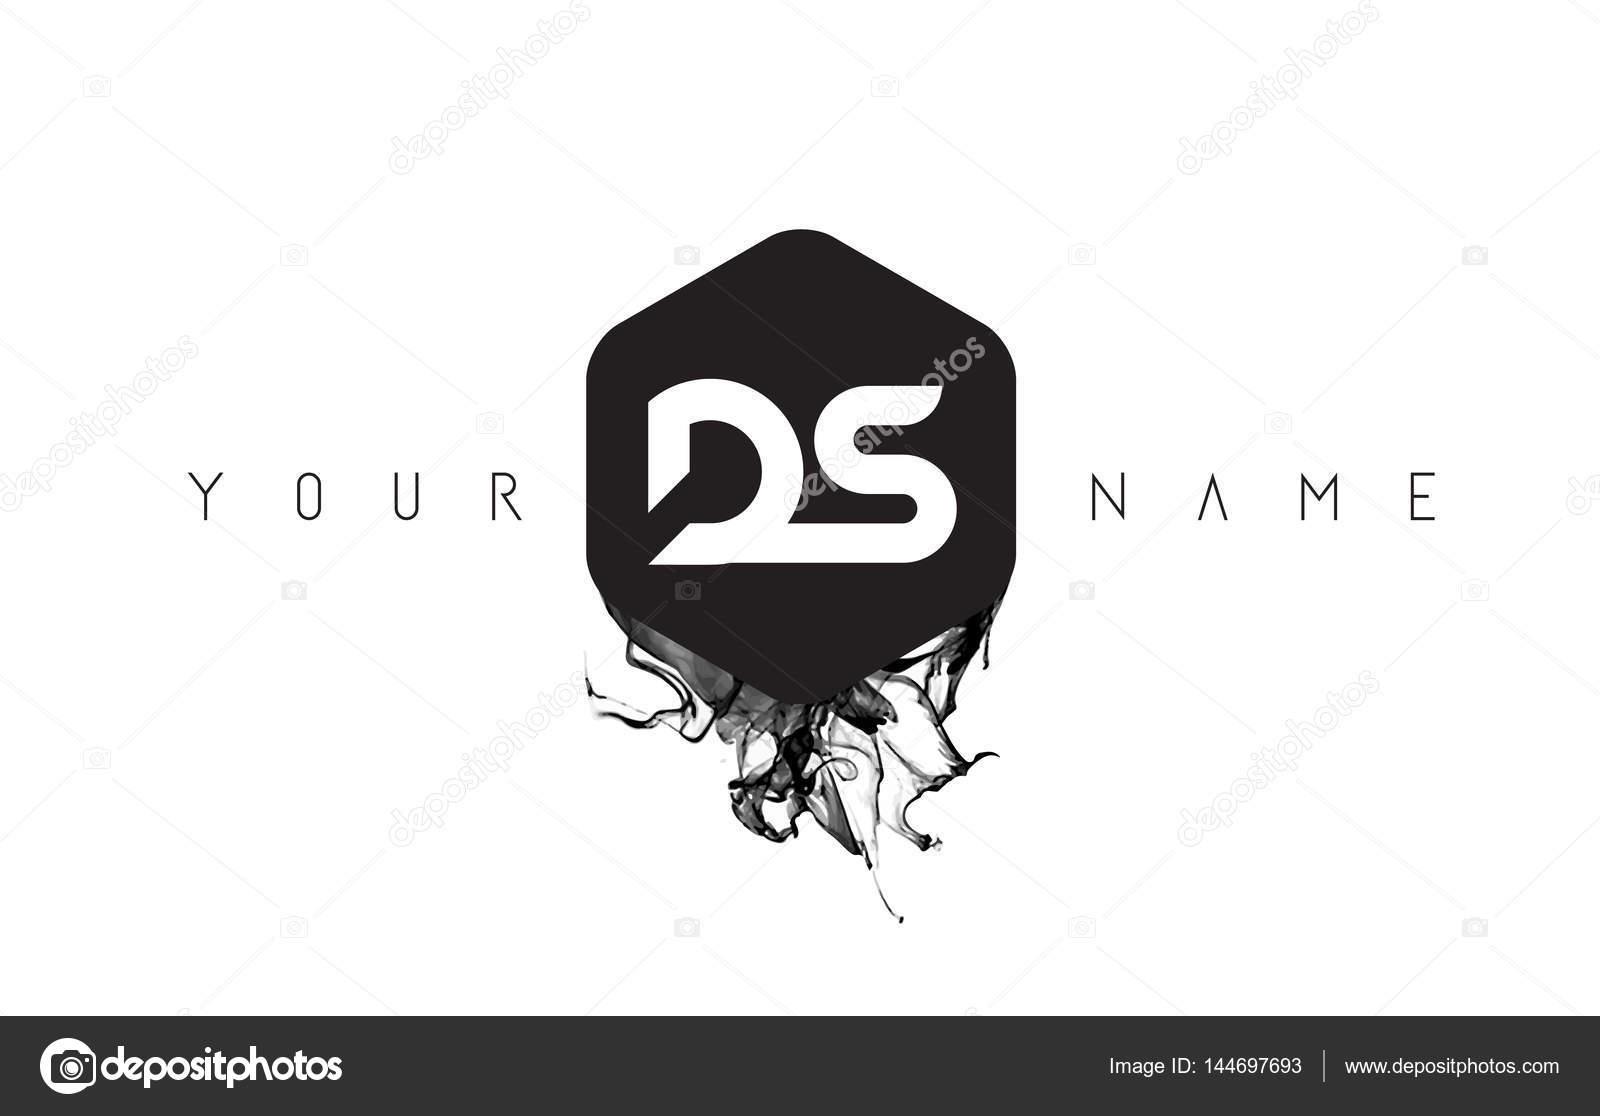 Ds Logo Vectors Free Download  seeklogocom